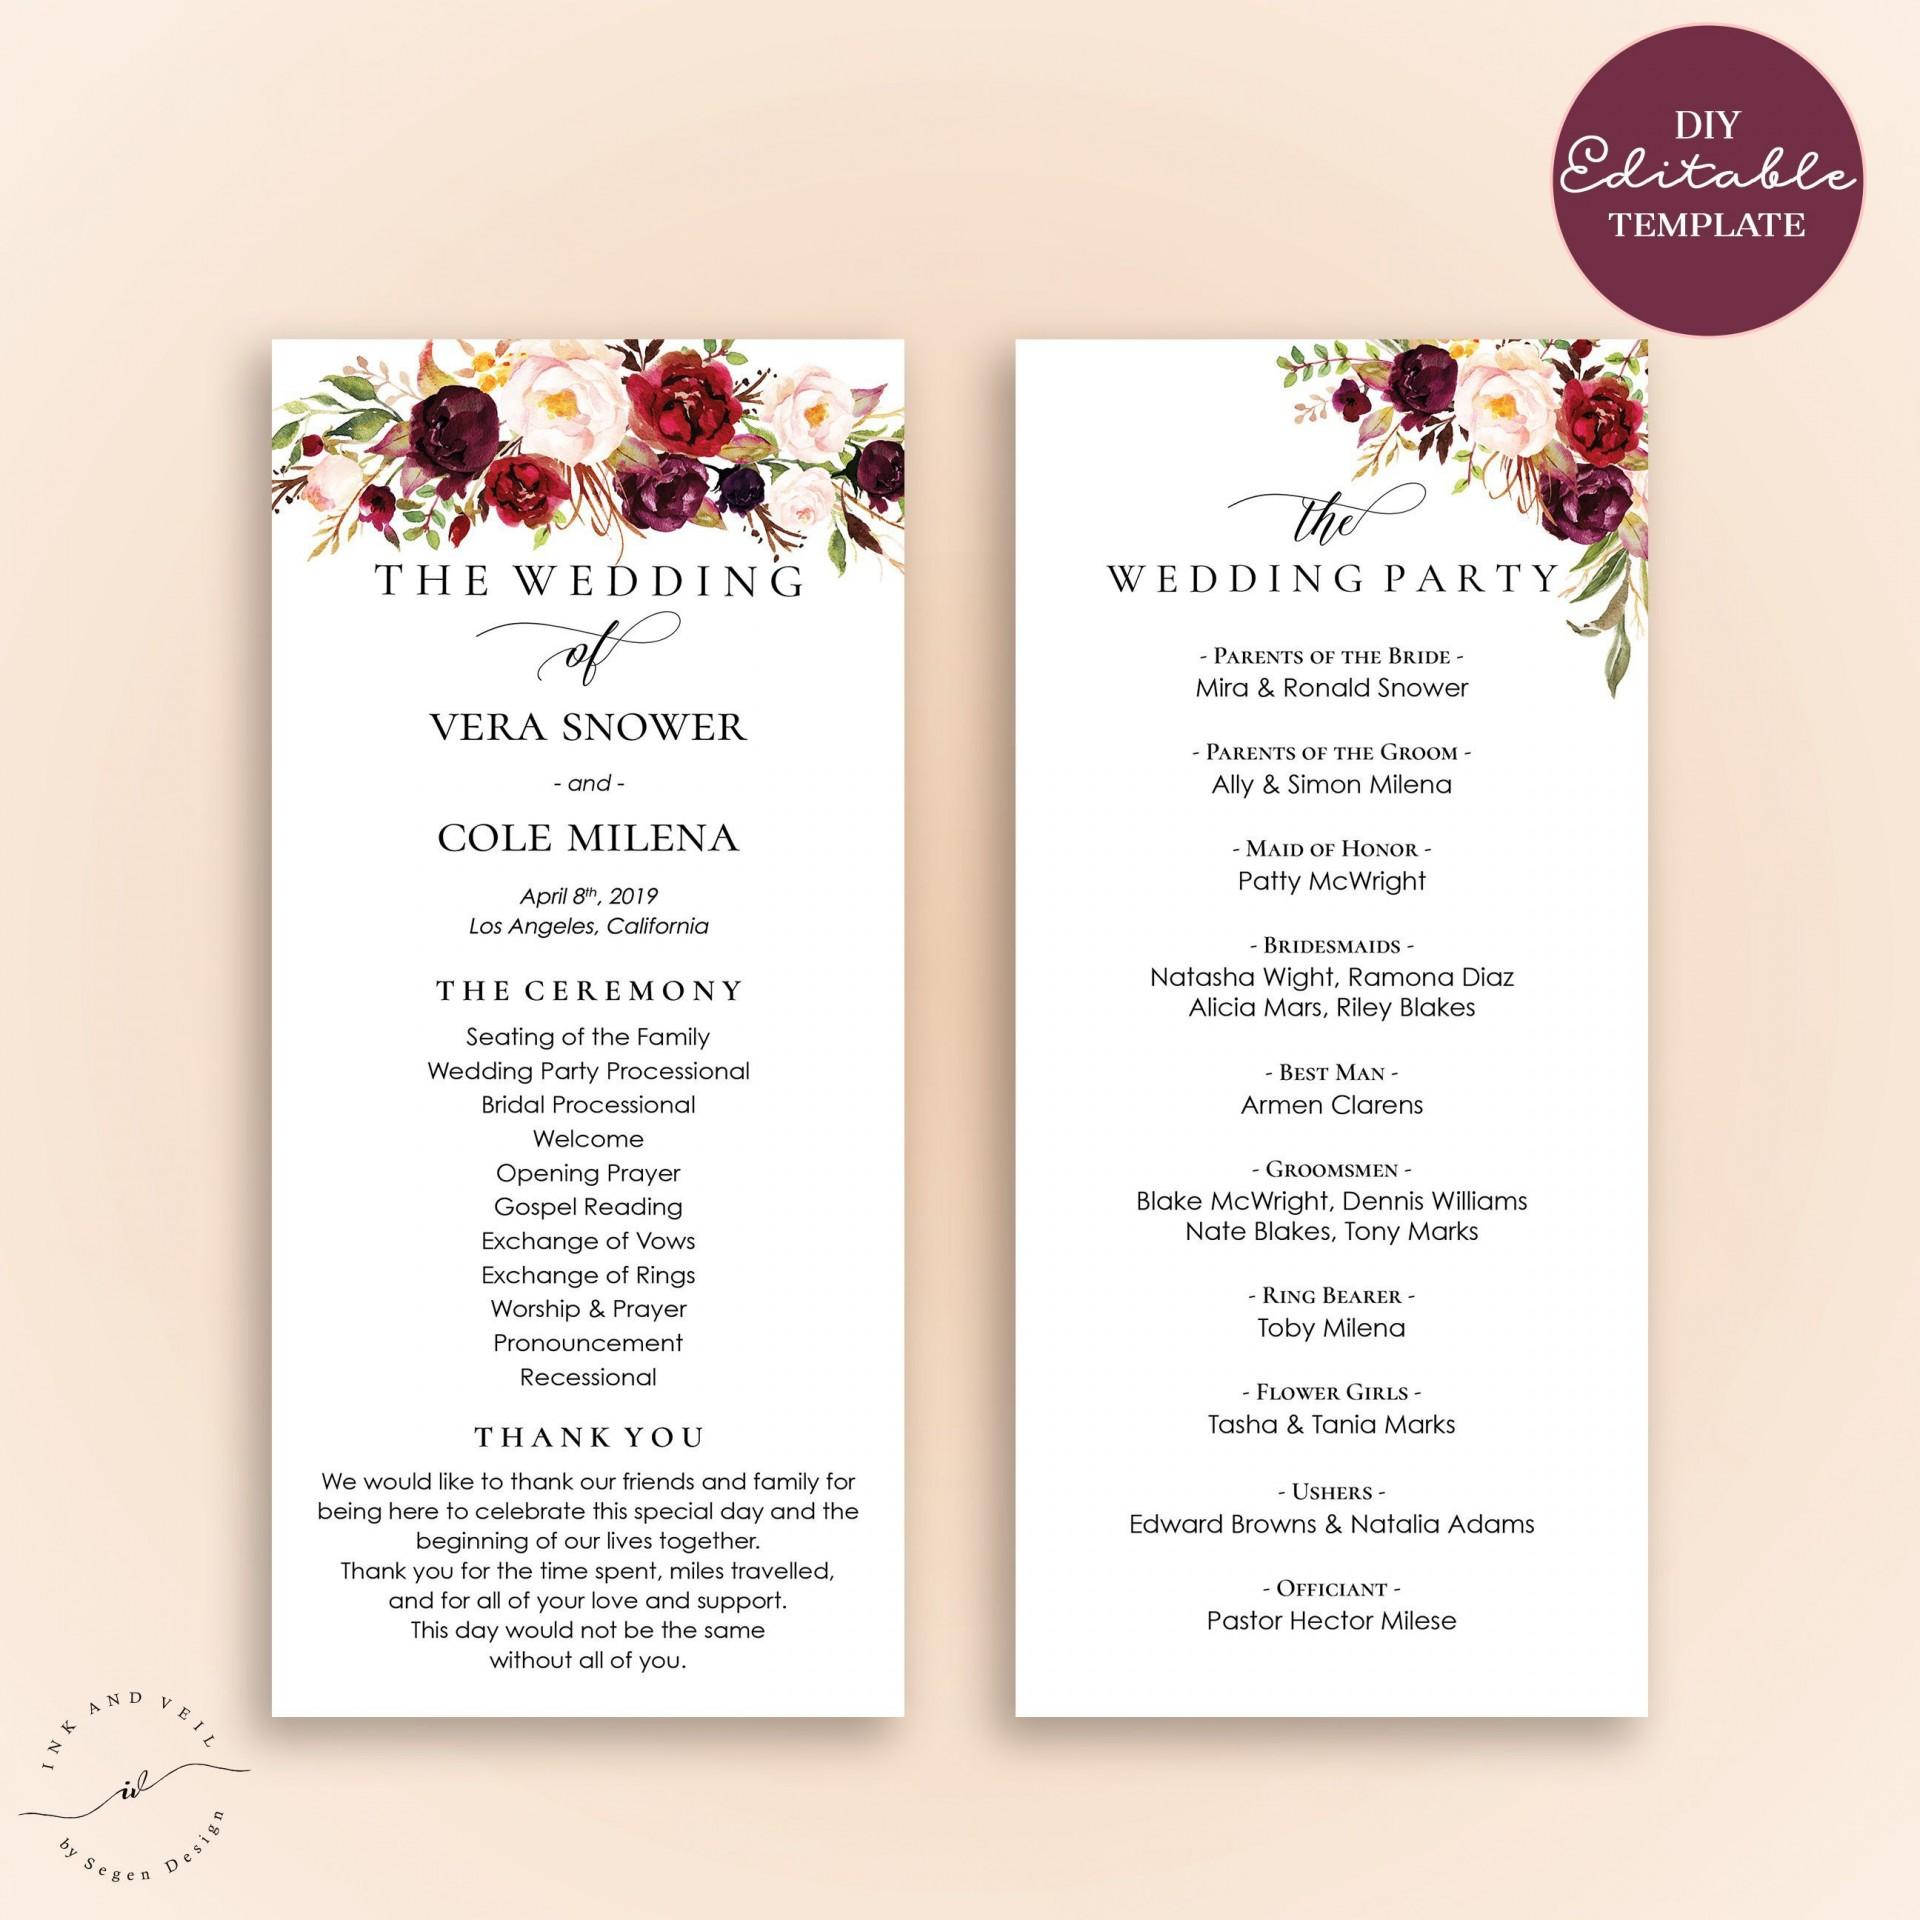 001 Best Wedding Program Template Free Concept  Fan Download Elegant1920